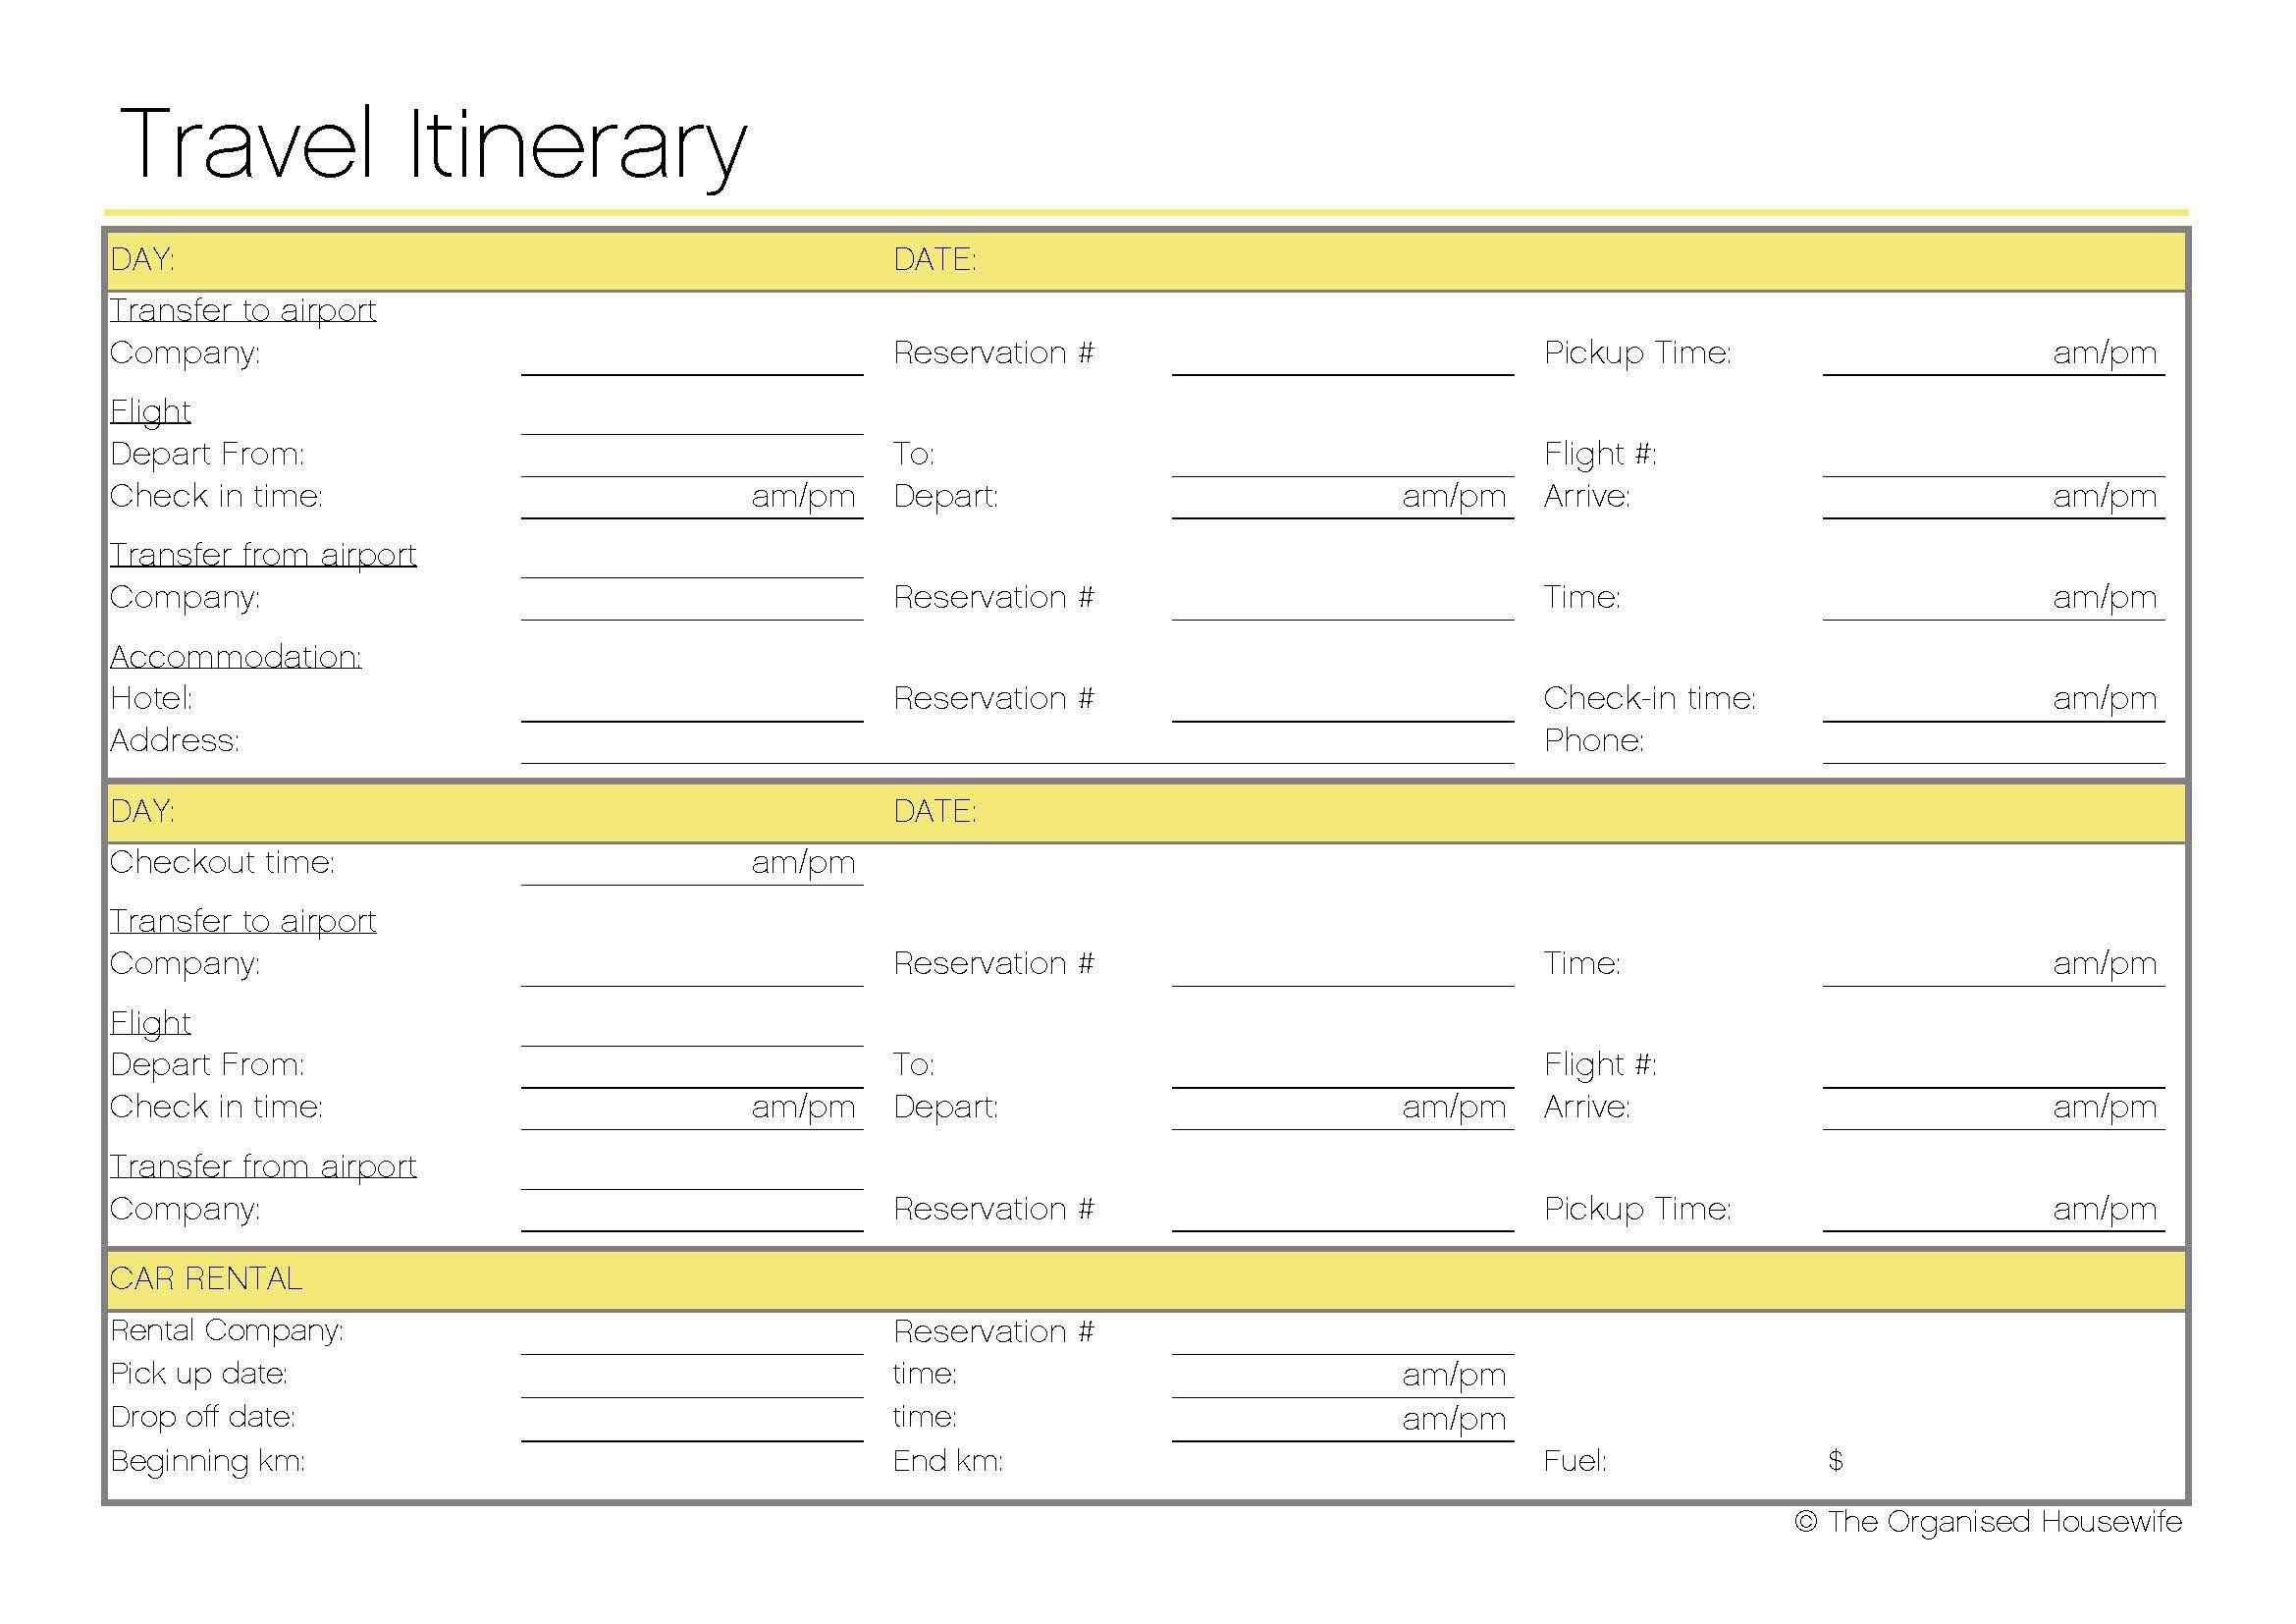 Free Printable - Travel Itinerary | Itineraries, Etc. | Pinterest - Free Printable Itinerary